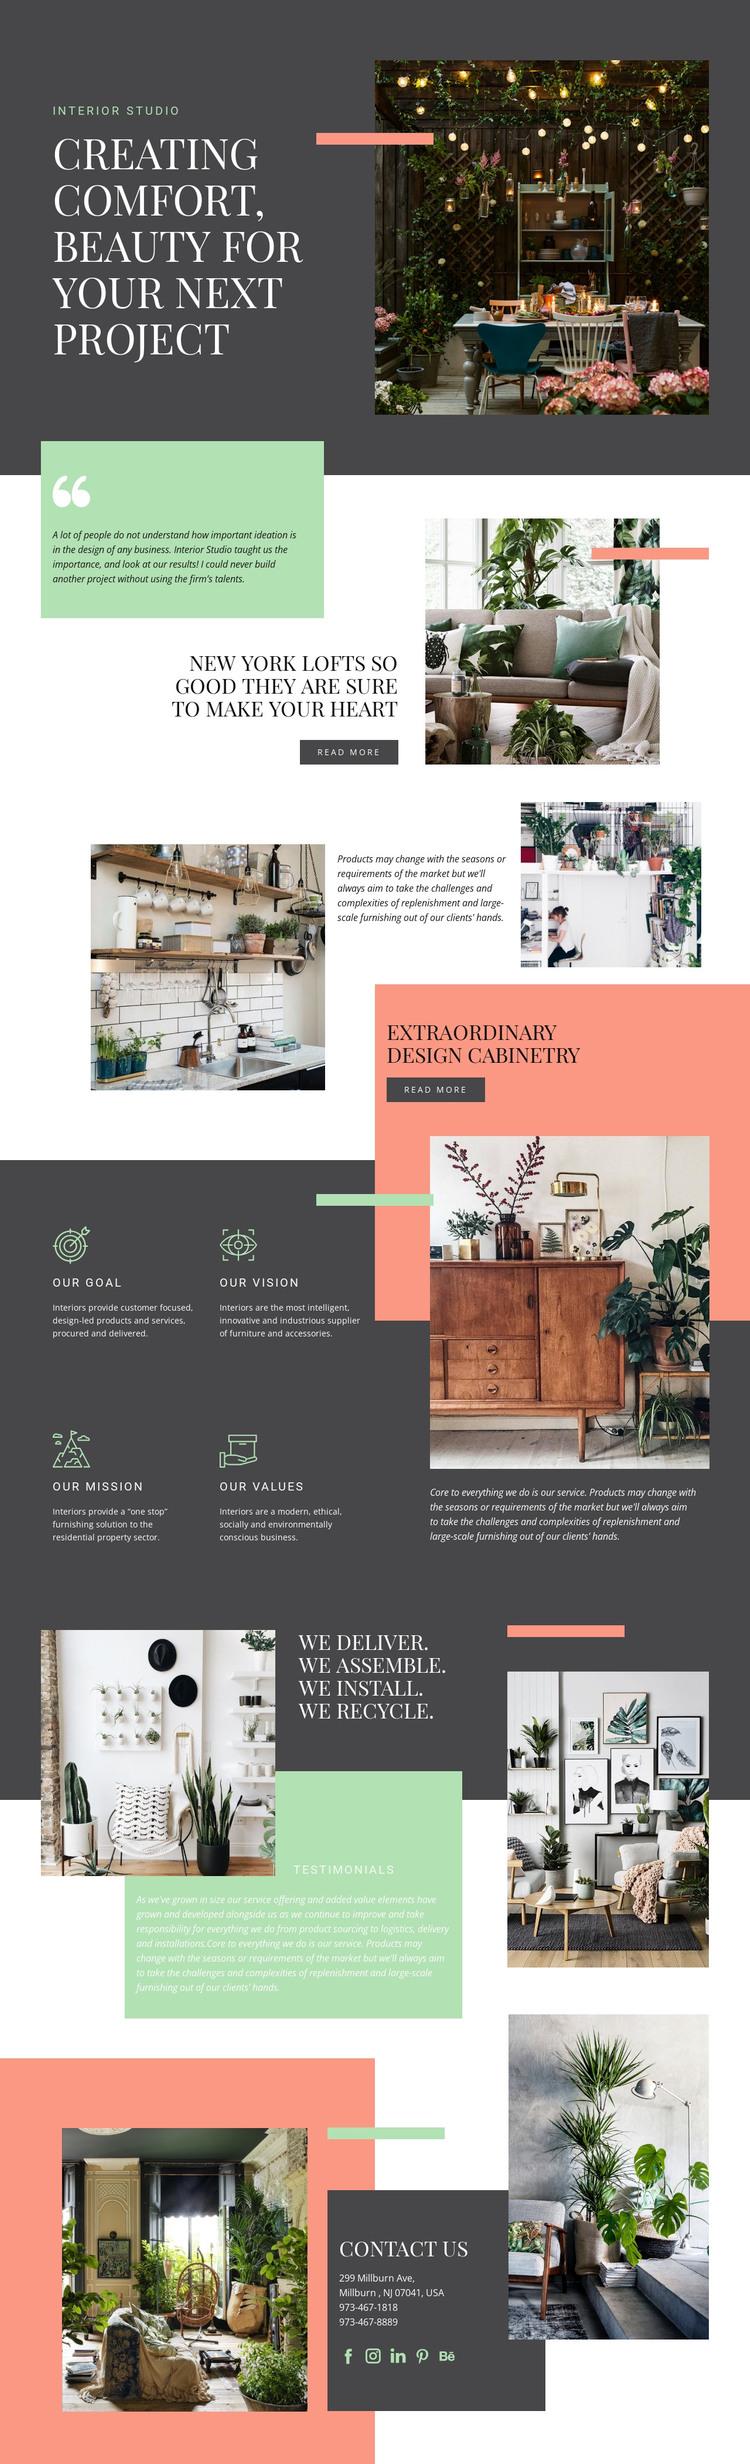 Comfort in your home WordPress Theme